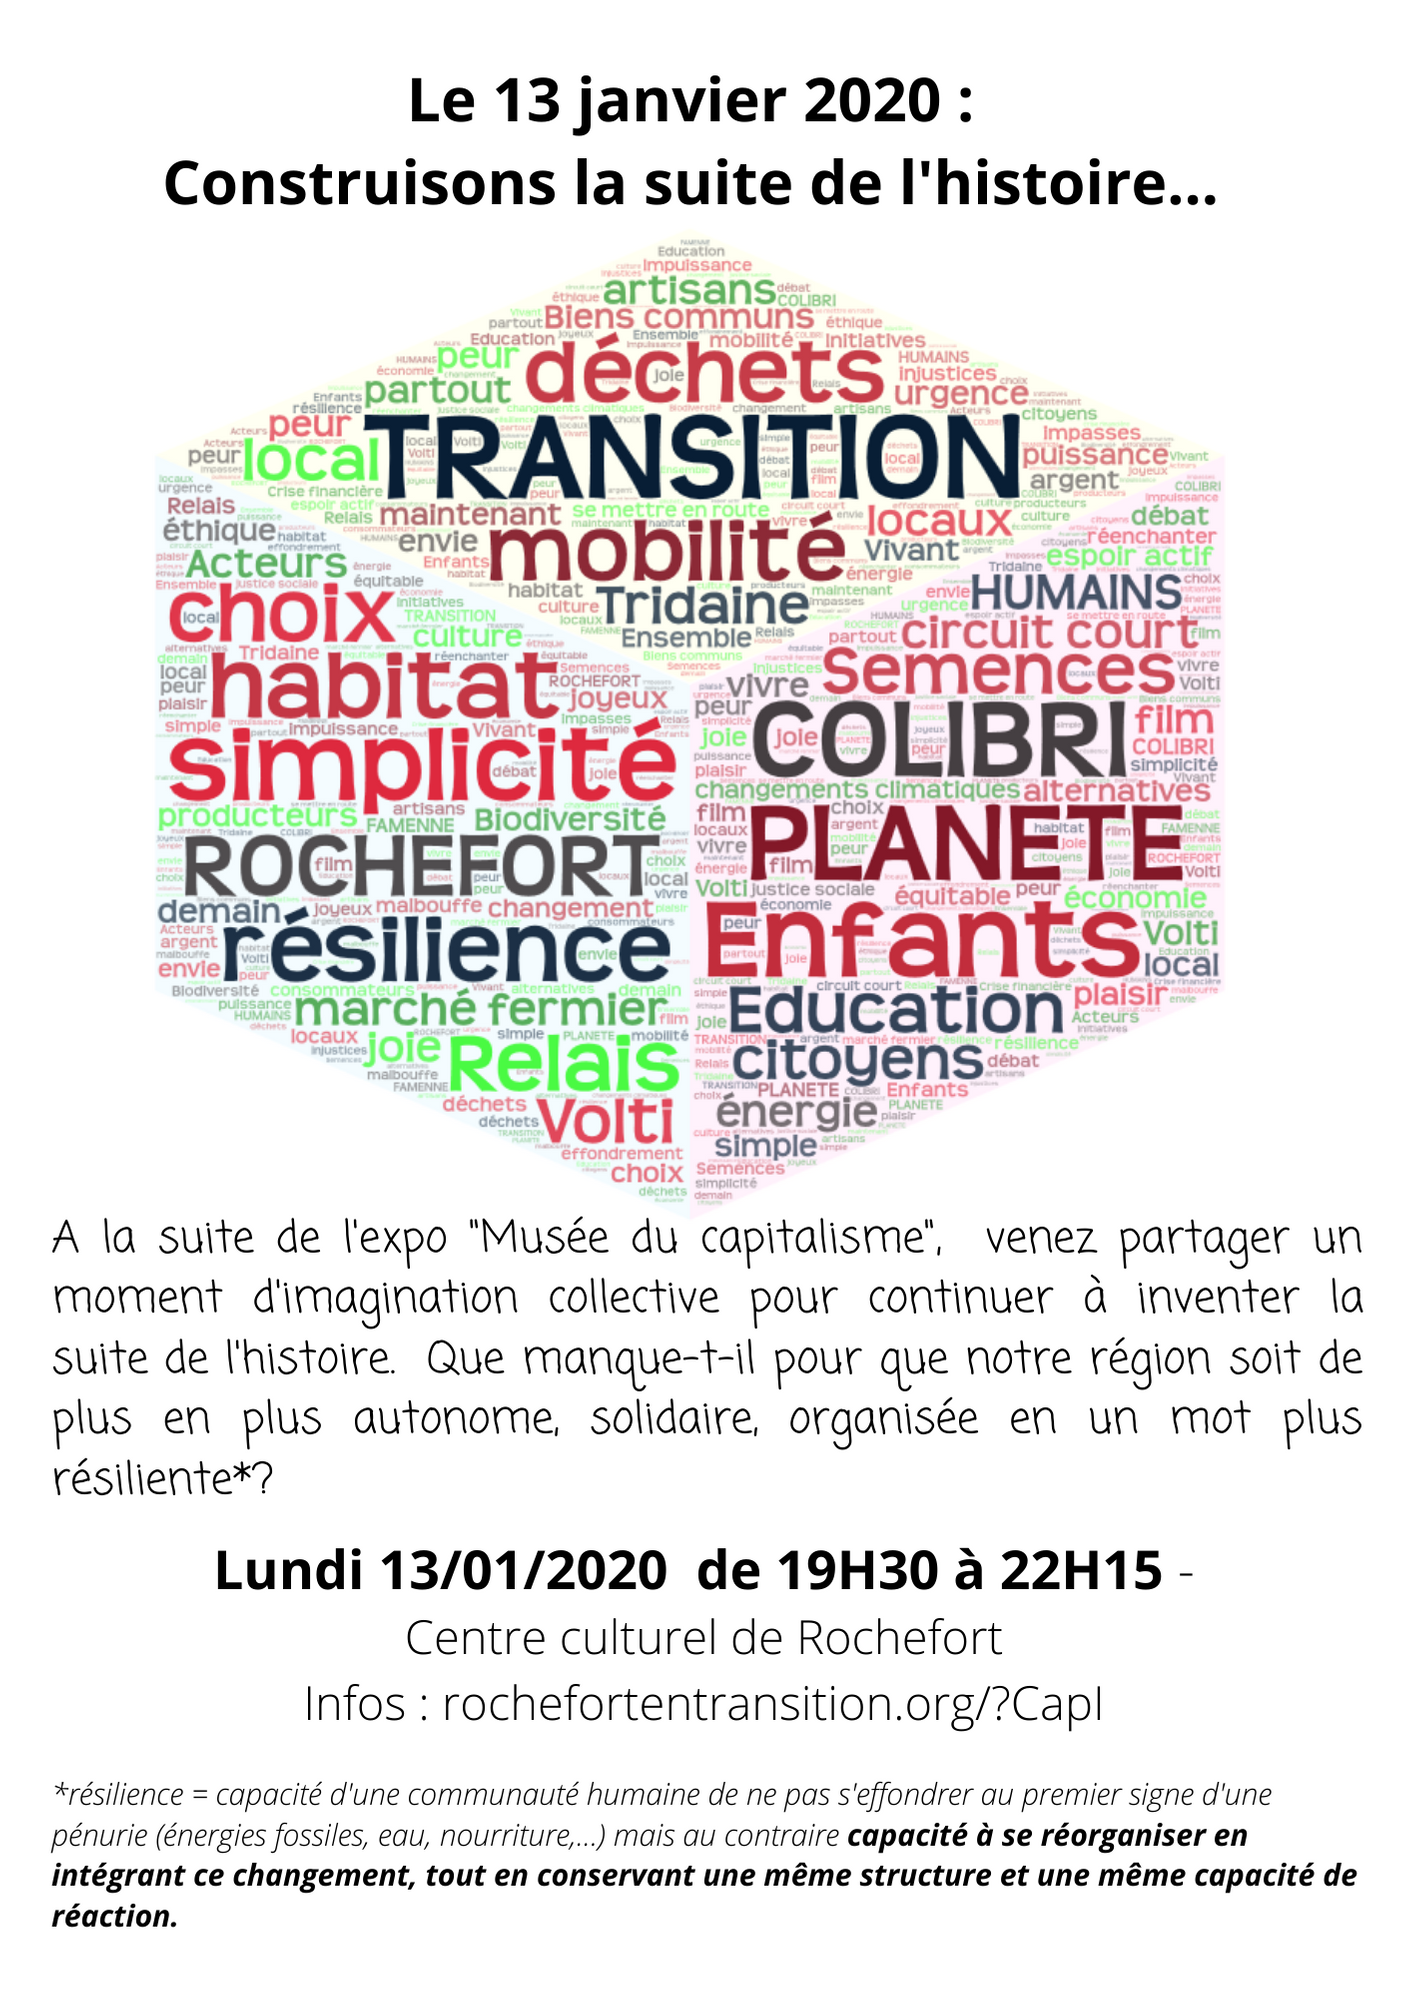 image 13_janvier.png (1.7MB)